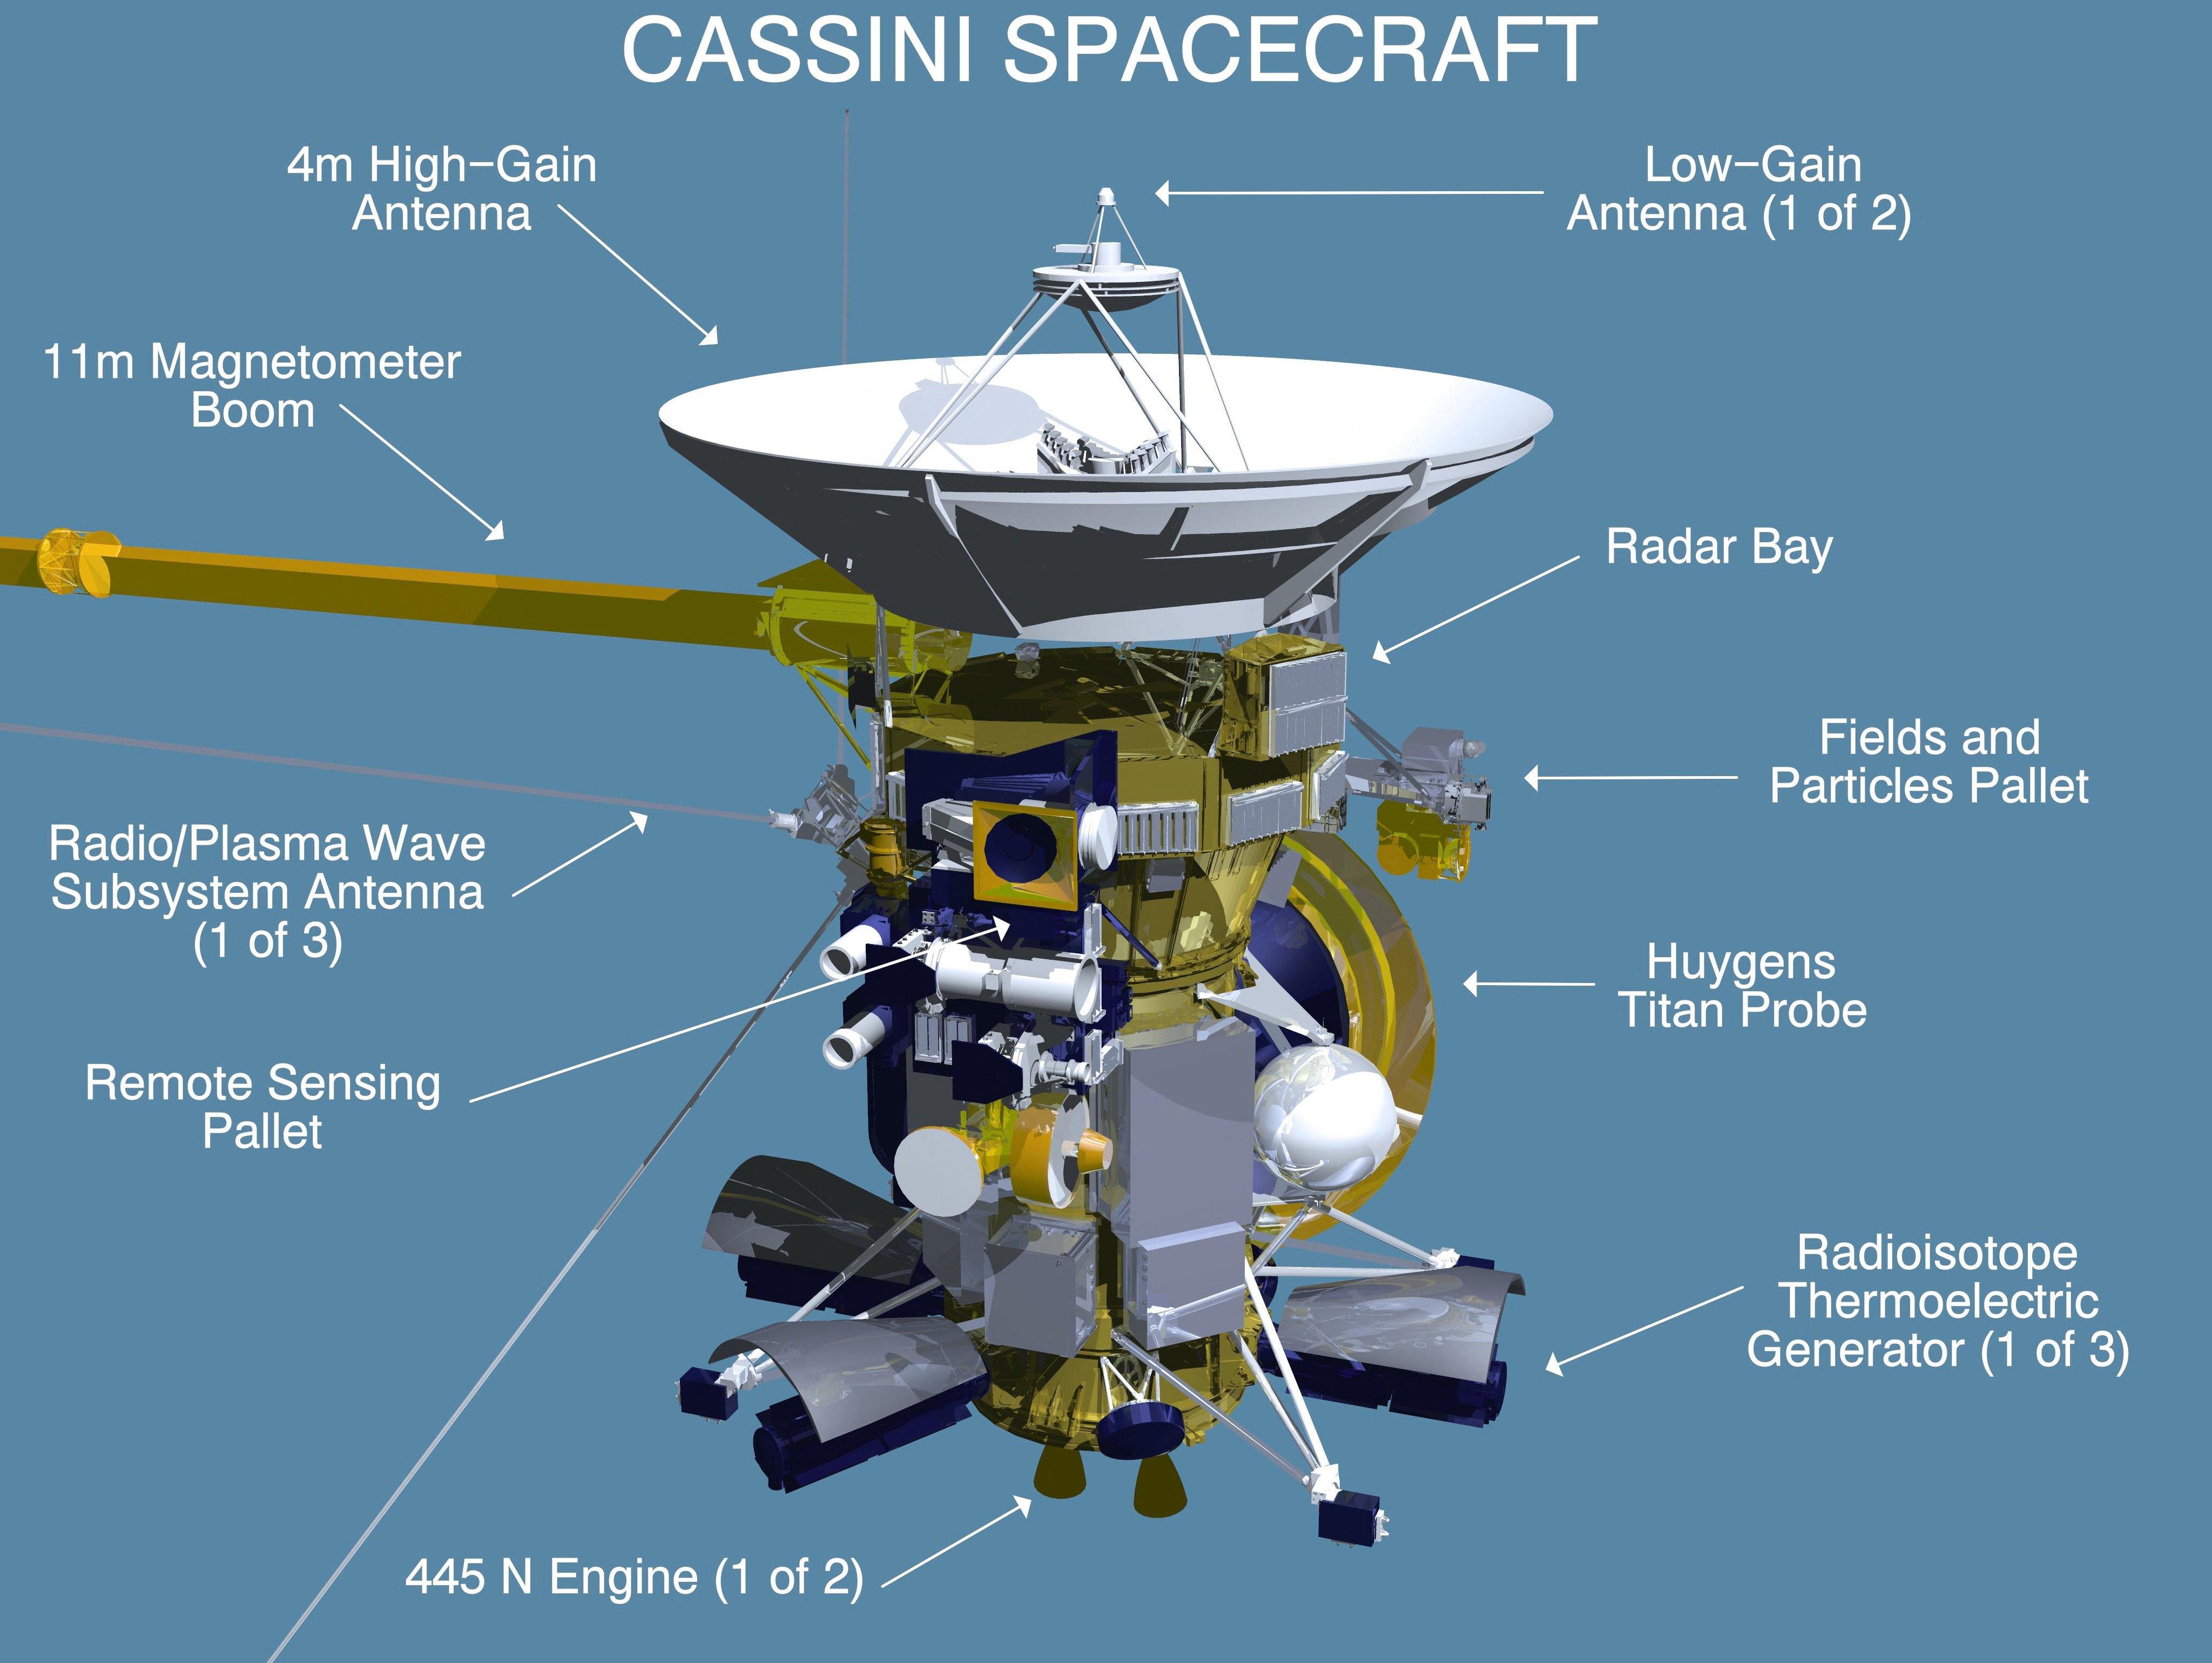 File:Cassini spacecraft.jpg - Wikimedia Commons